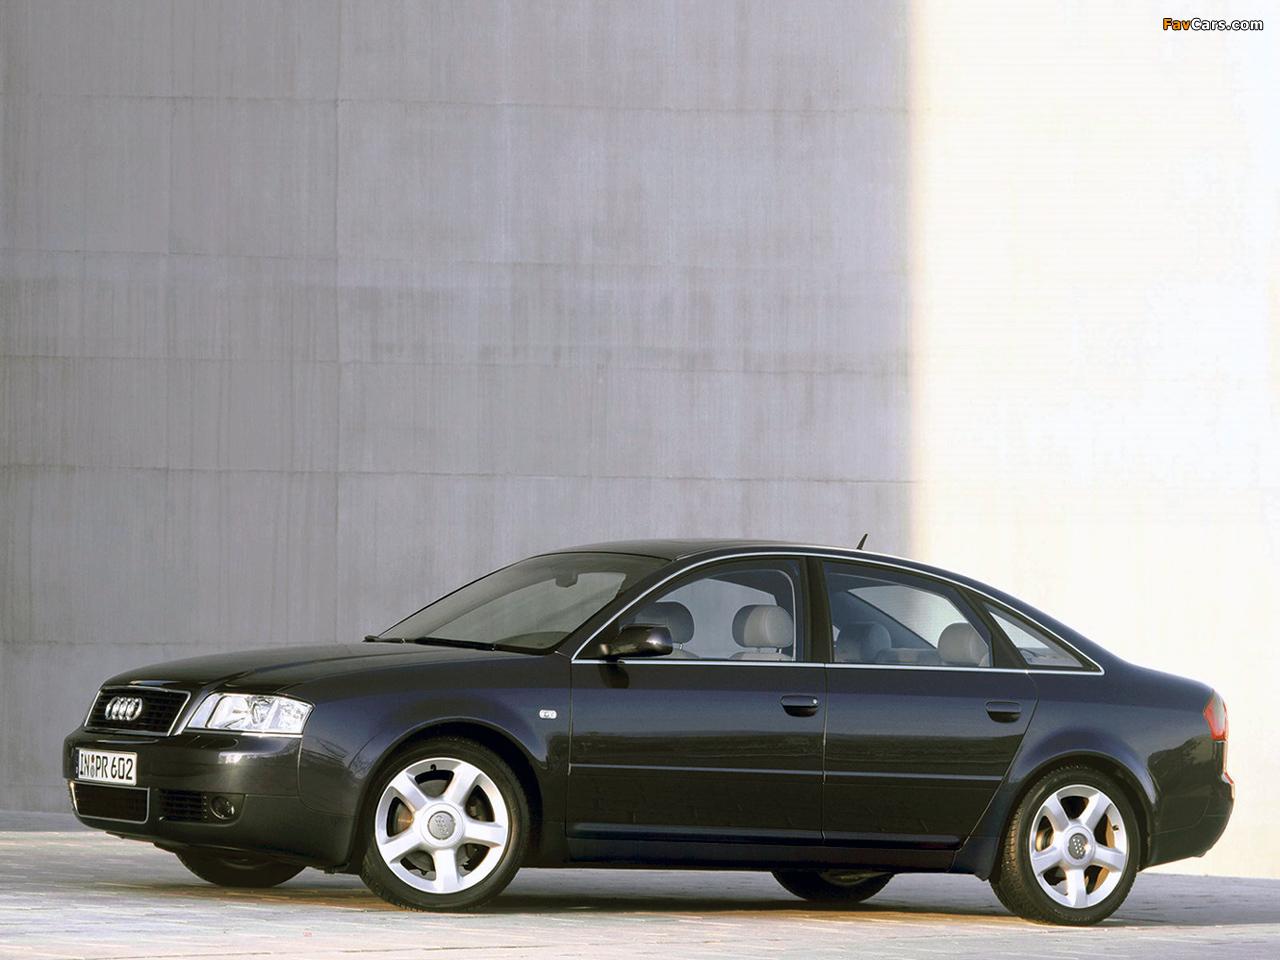 Audi A6 3 0 Sedan 4b C5 2001 04 Images 1280x960